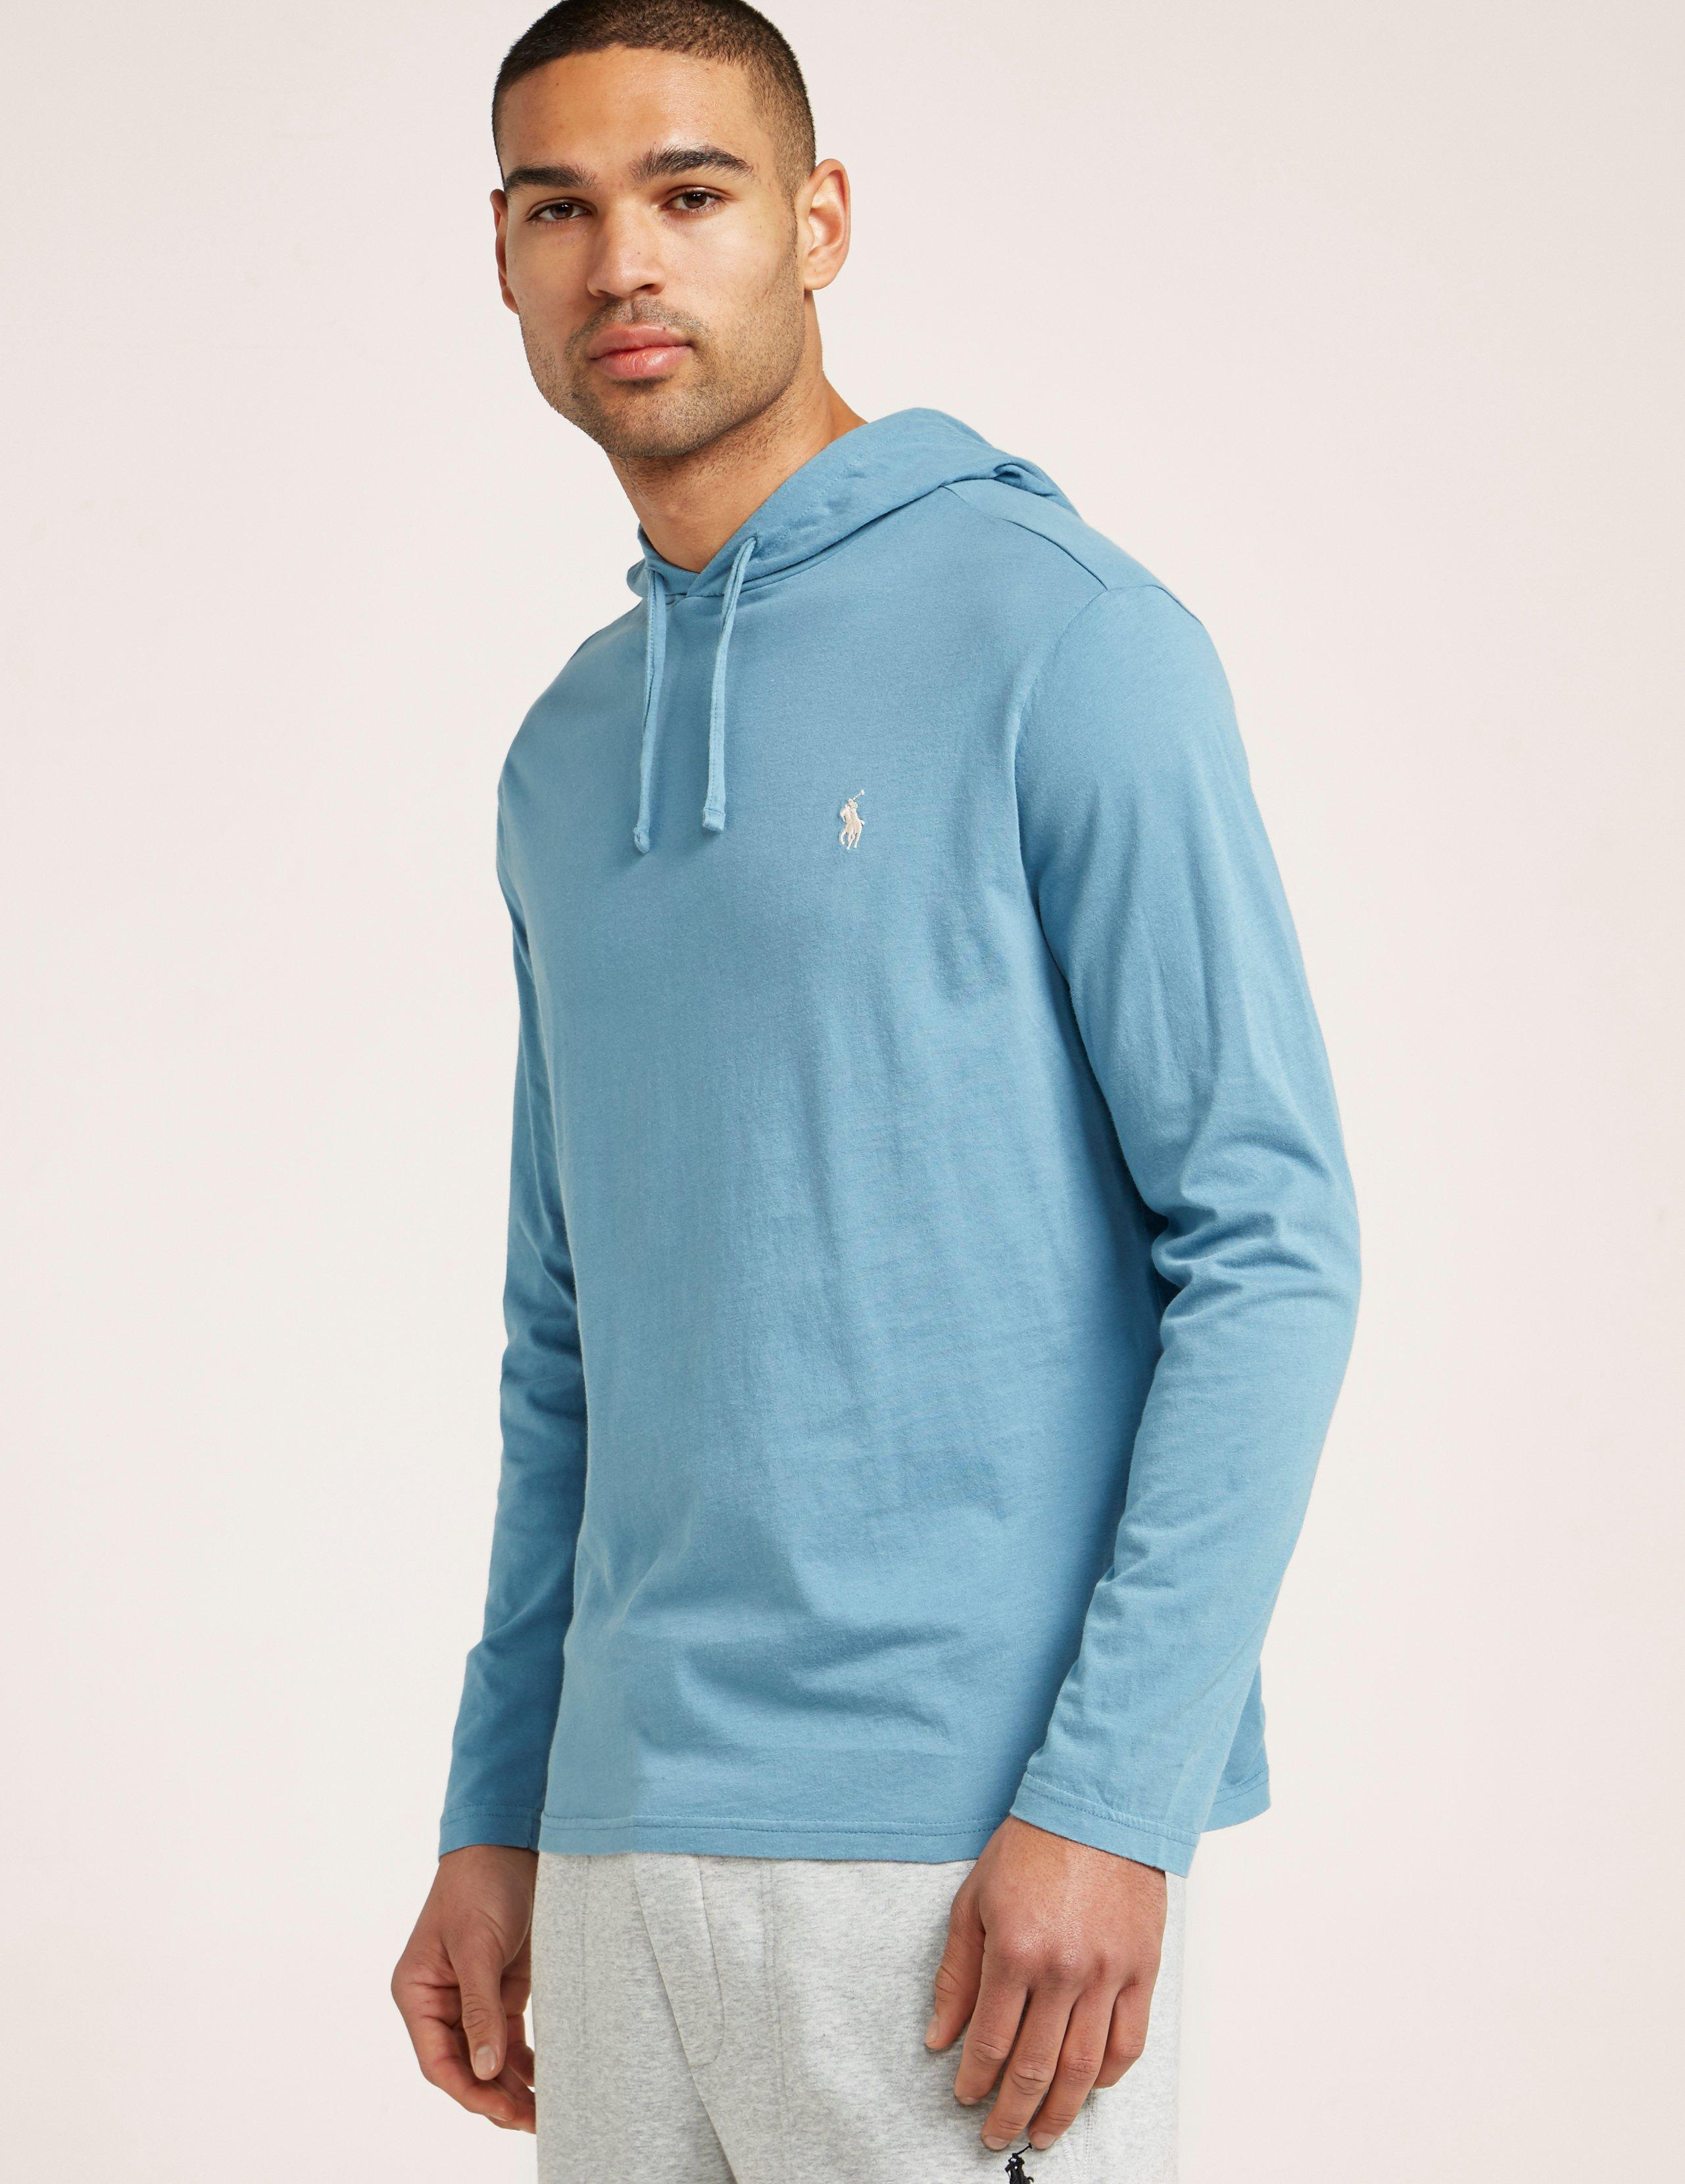 Mens Long Sleeve Hooded T-shirt Blue